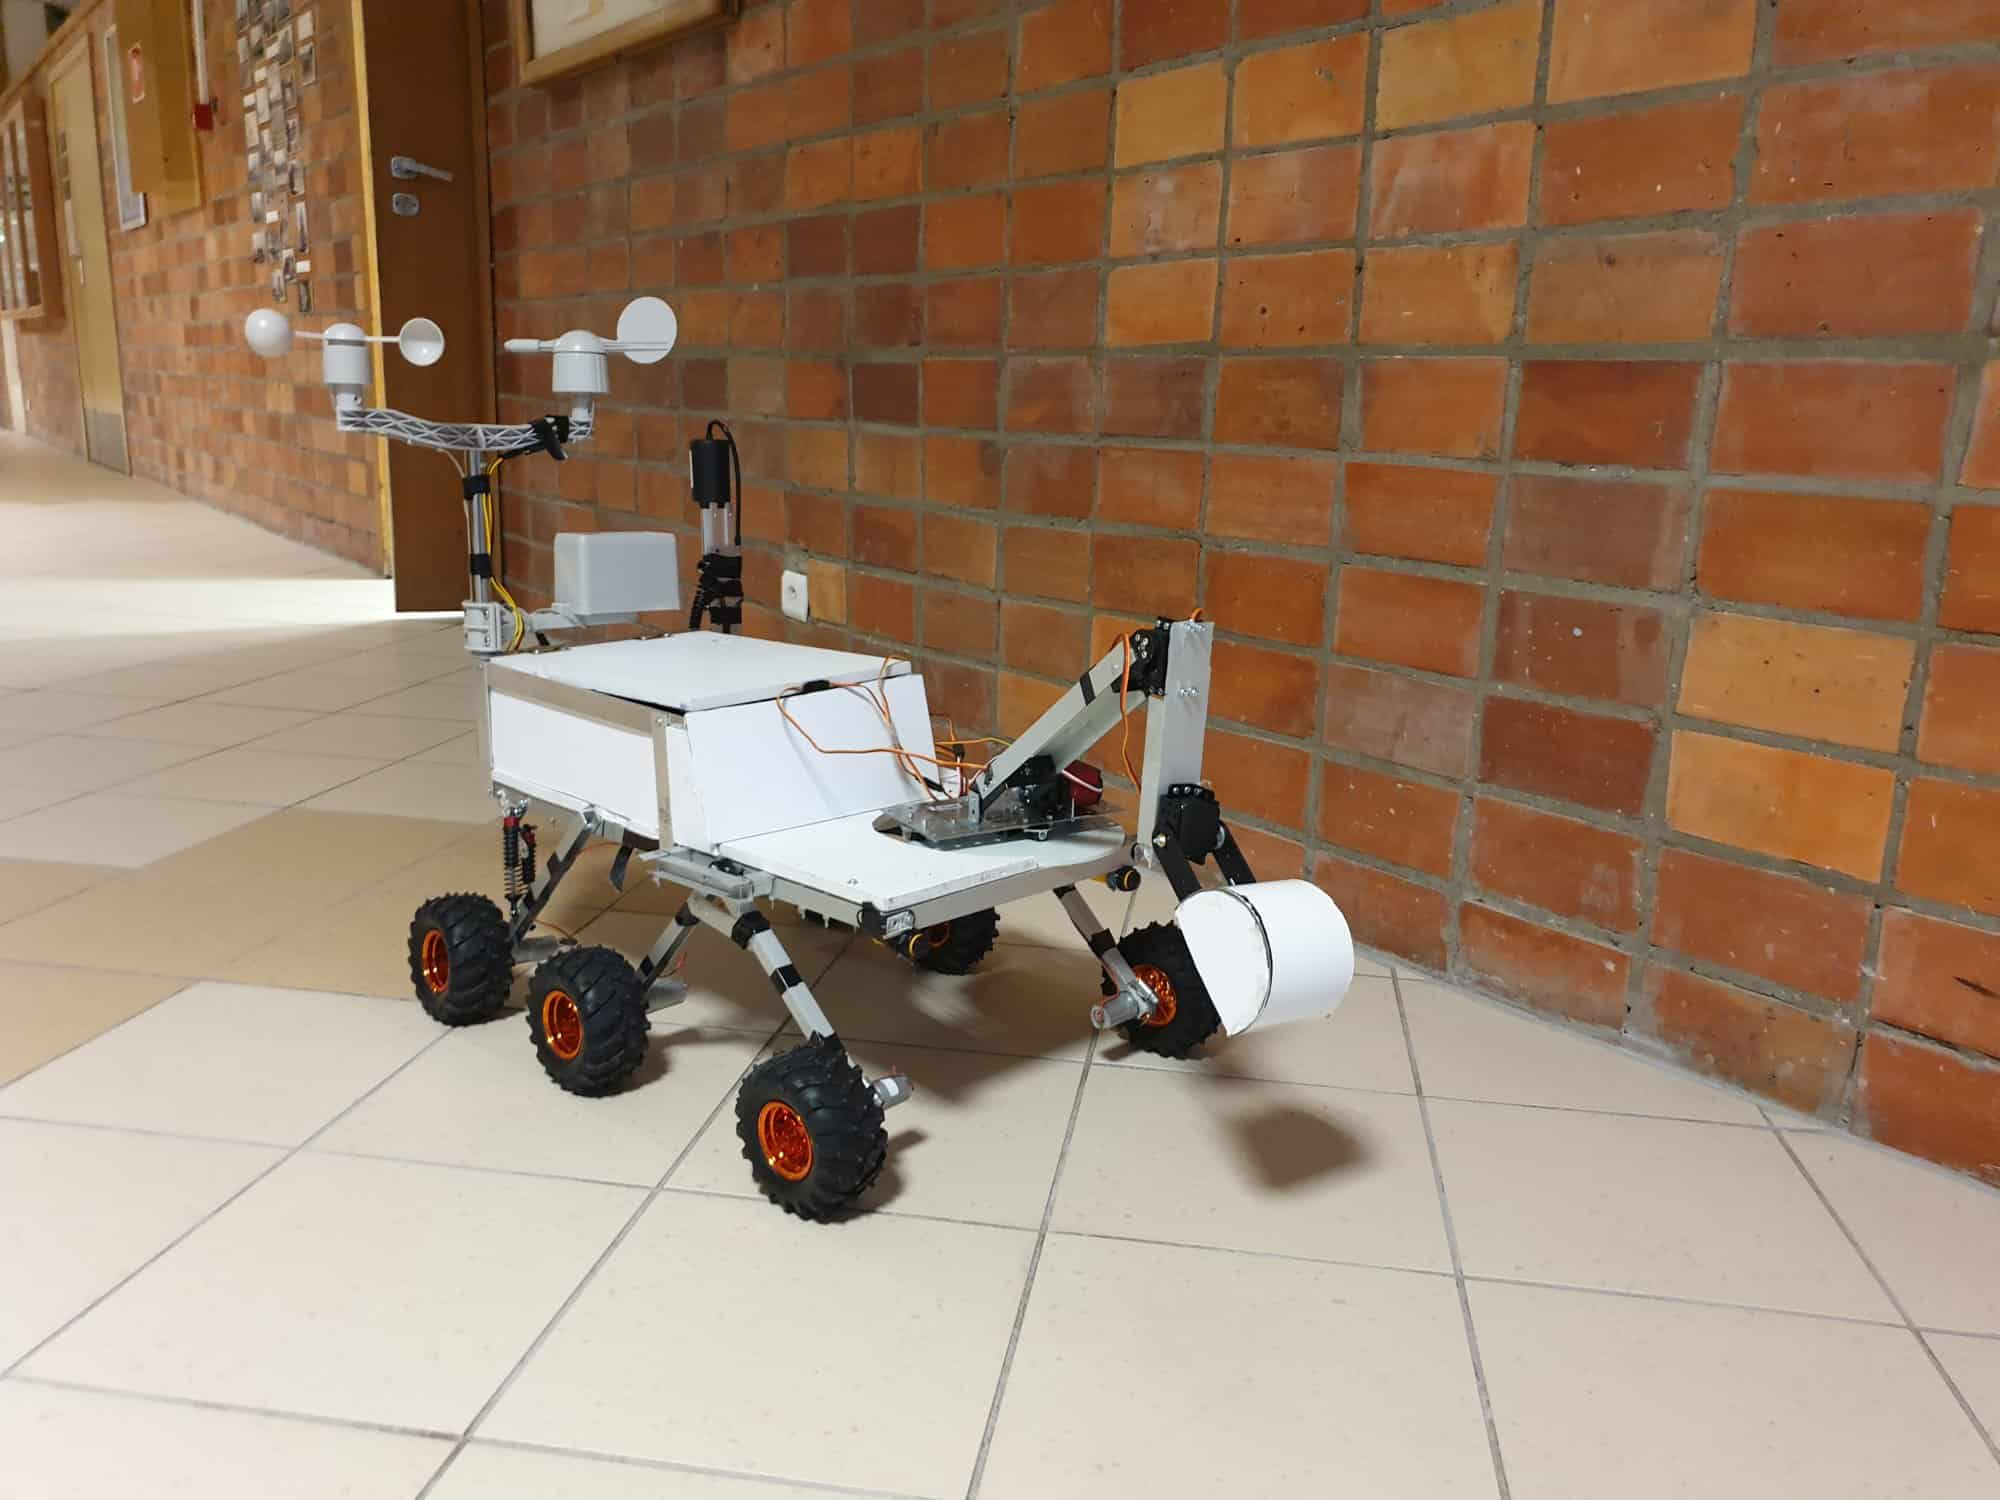 Researcher - robot badawczy